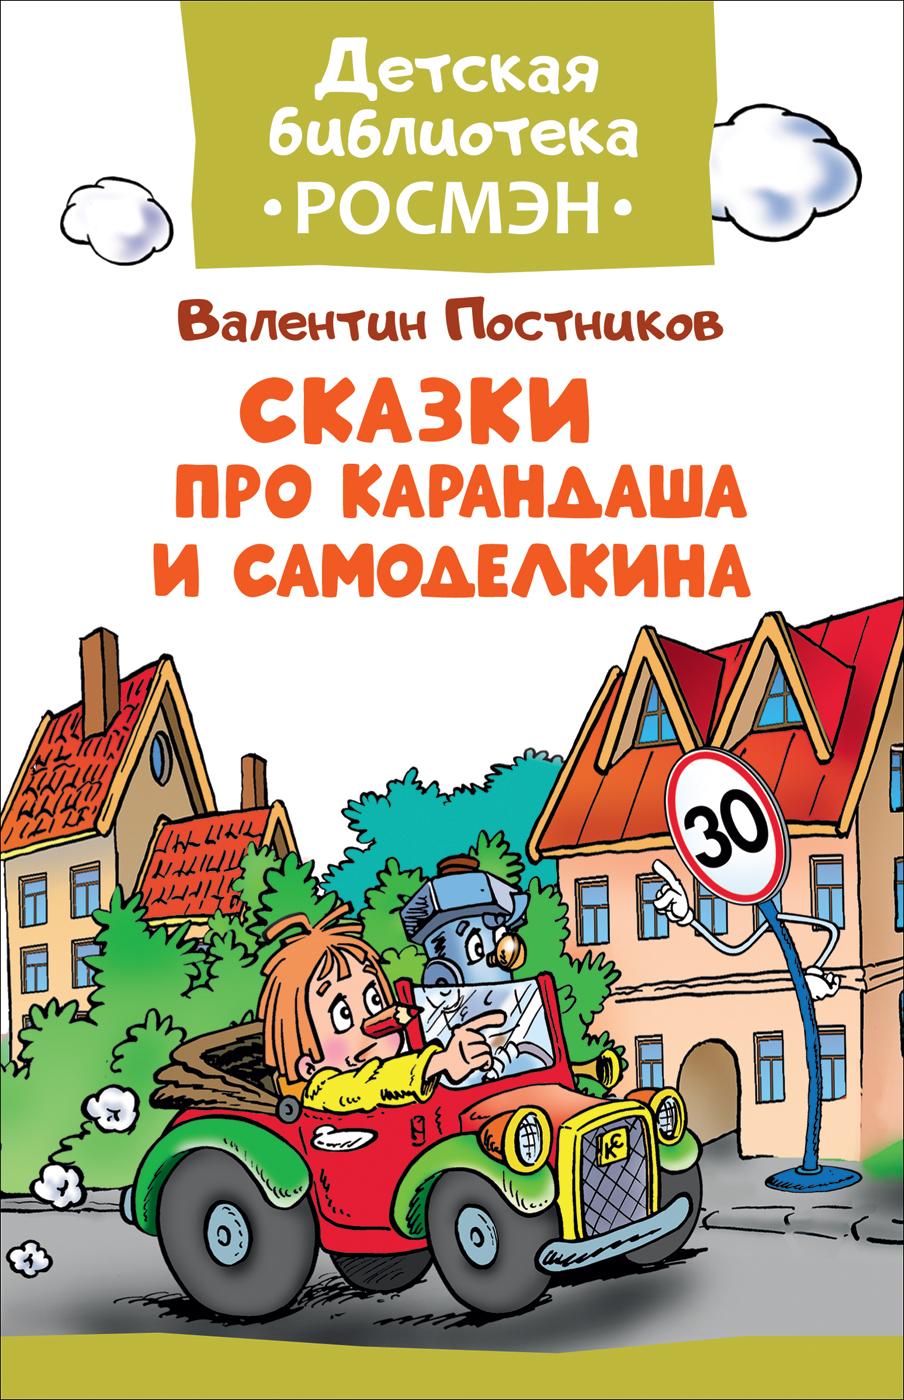 Постников В.Ф. Сказки про Карандаша и Самоделкина (ДБ РОСМЭН)